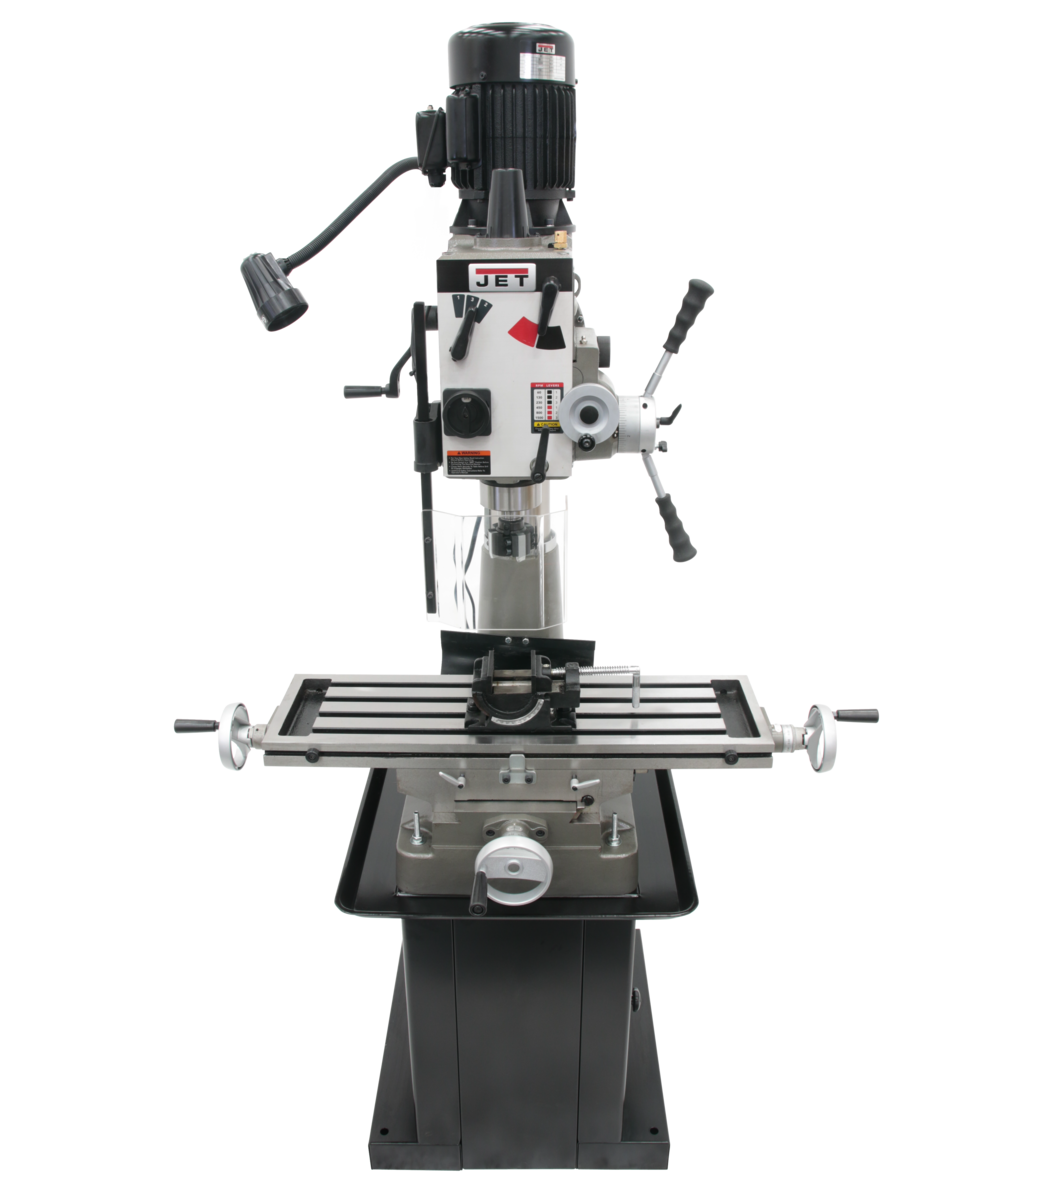 JMD-40GHPF Geared Head Mill/Drill with Power Downfeed